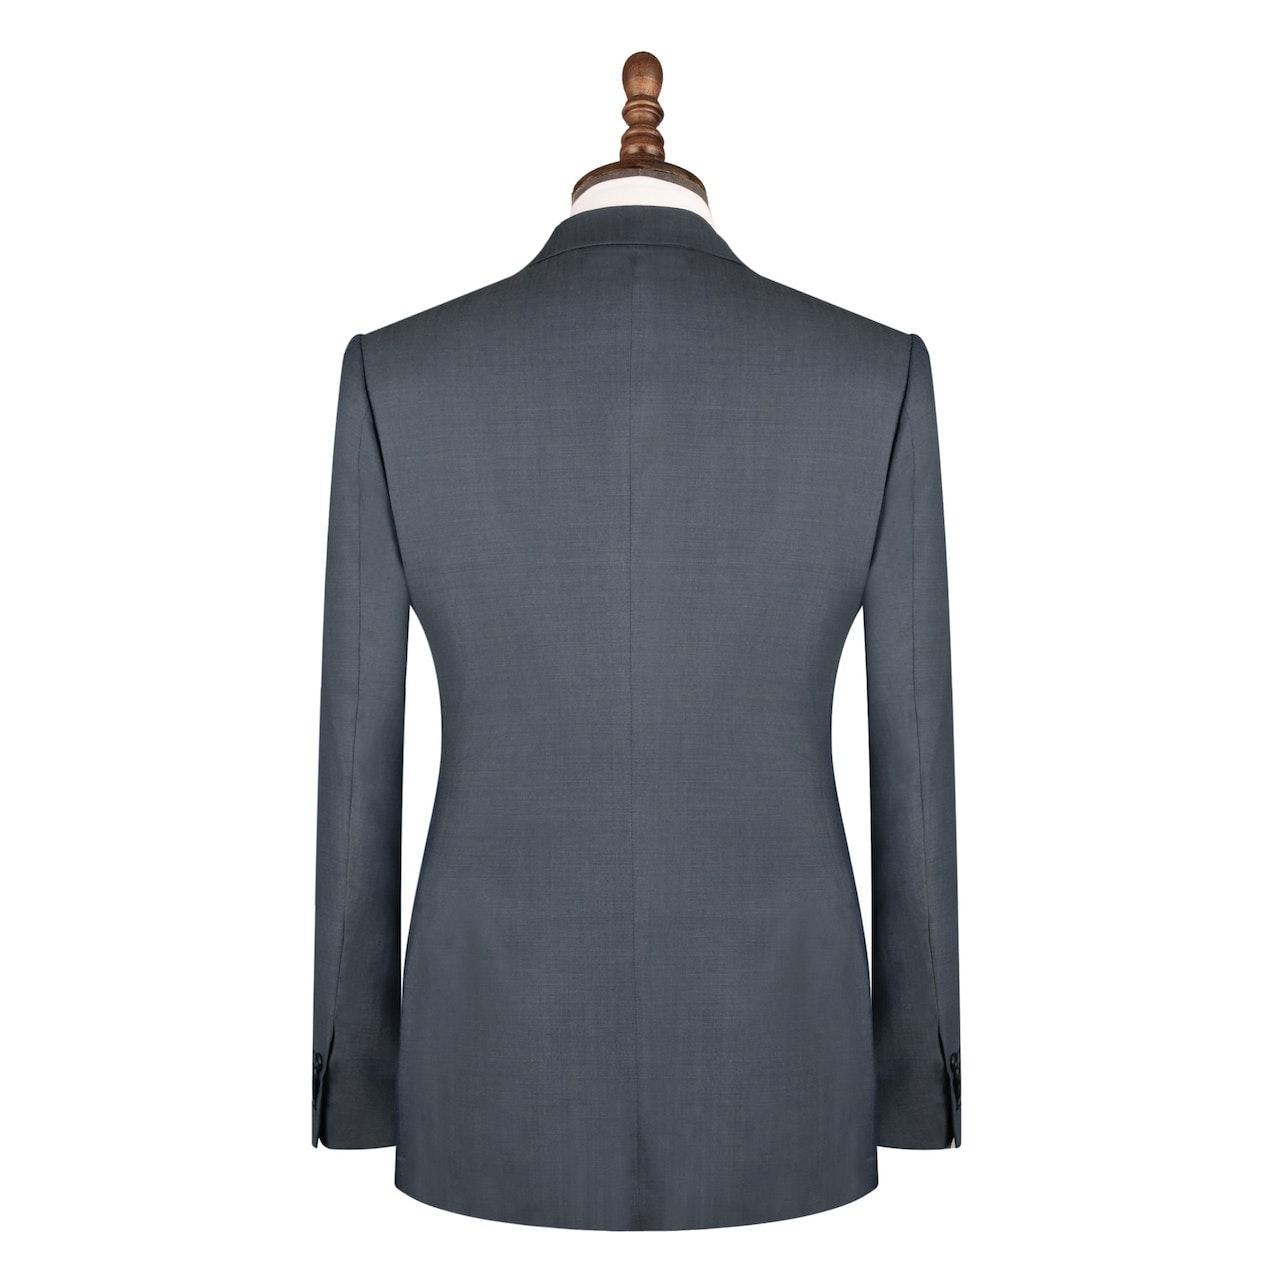 InStitchu Suit Fabric 9